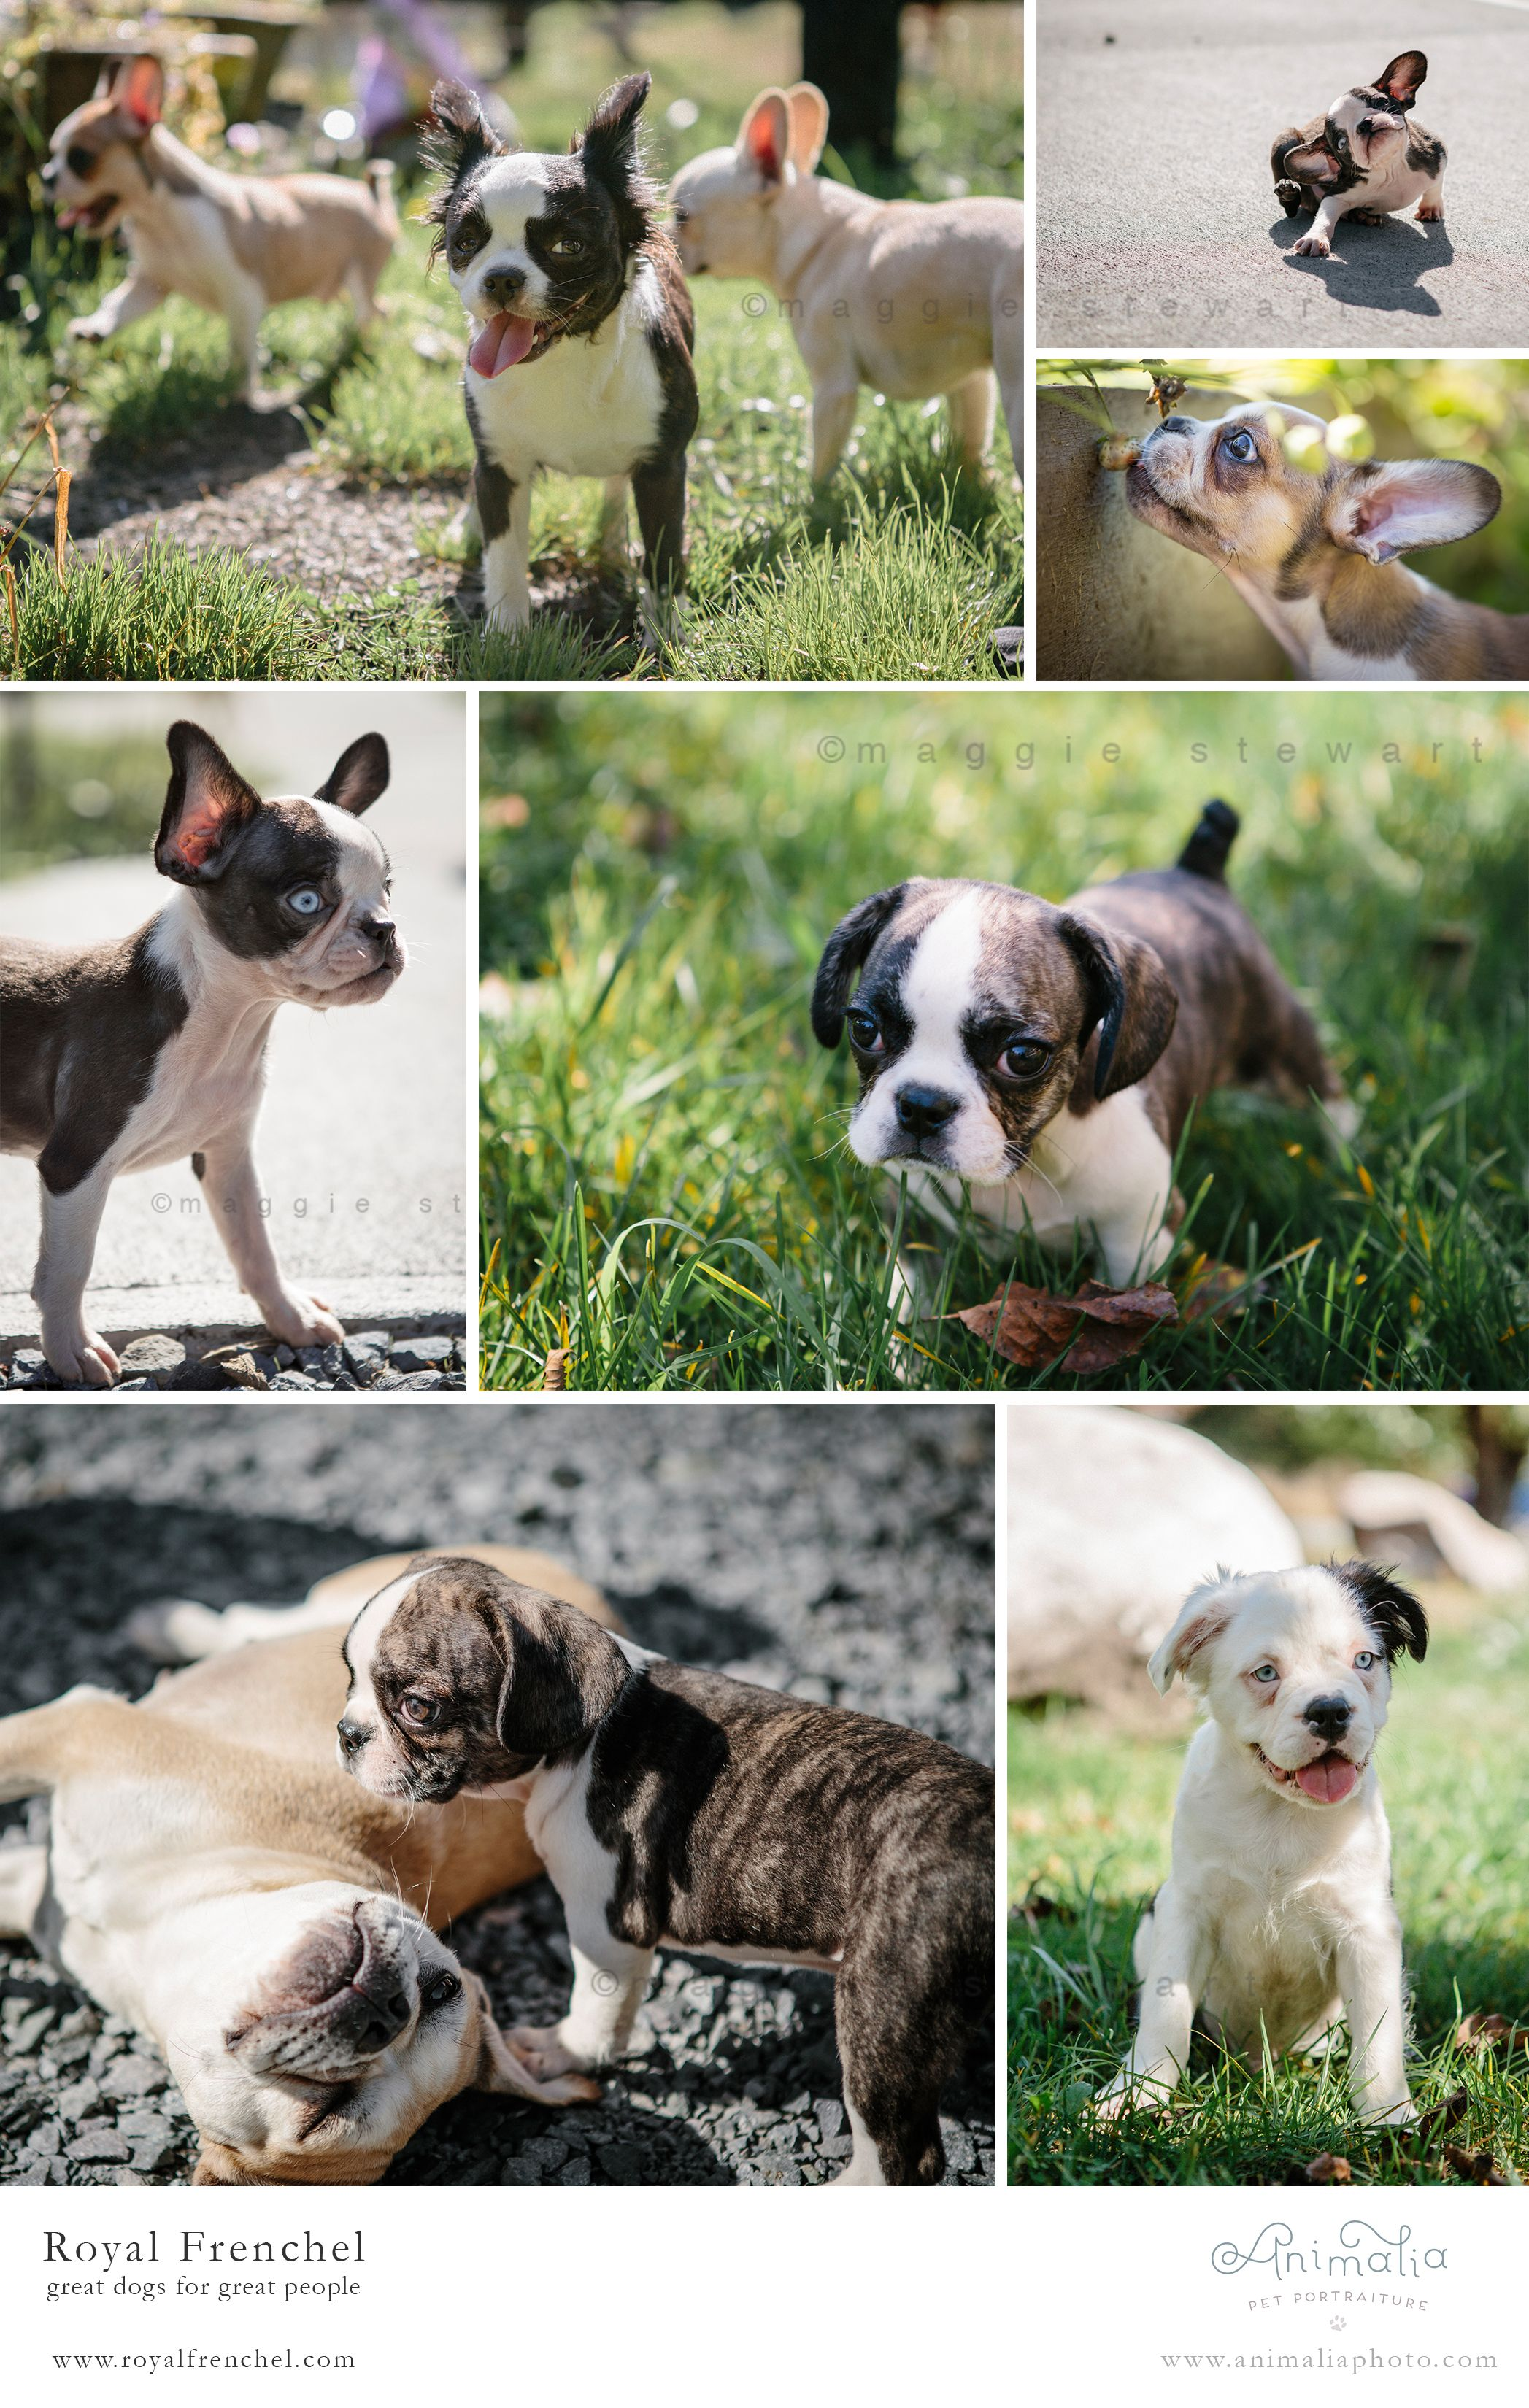 Royal Frenchel Photo Shoot   Royal Frenchel Pups   Dogs, Dog